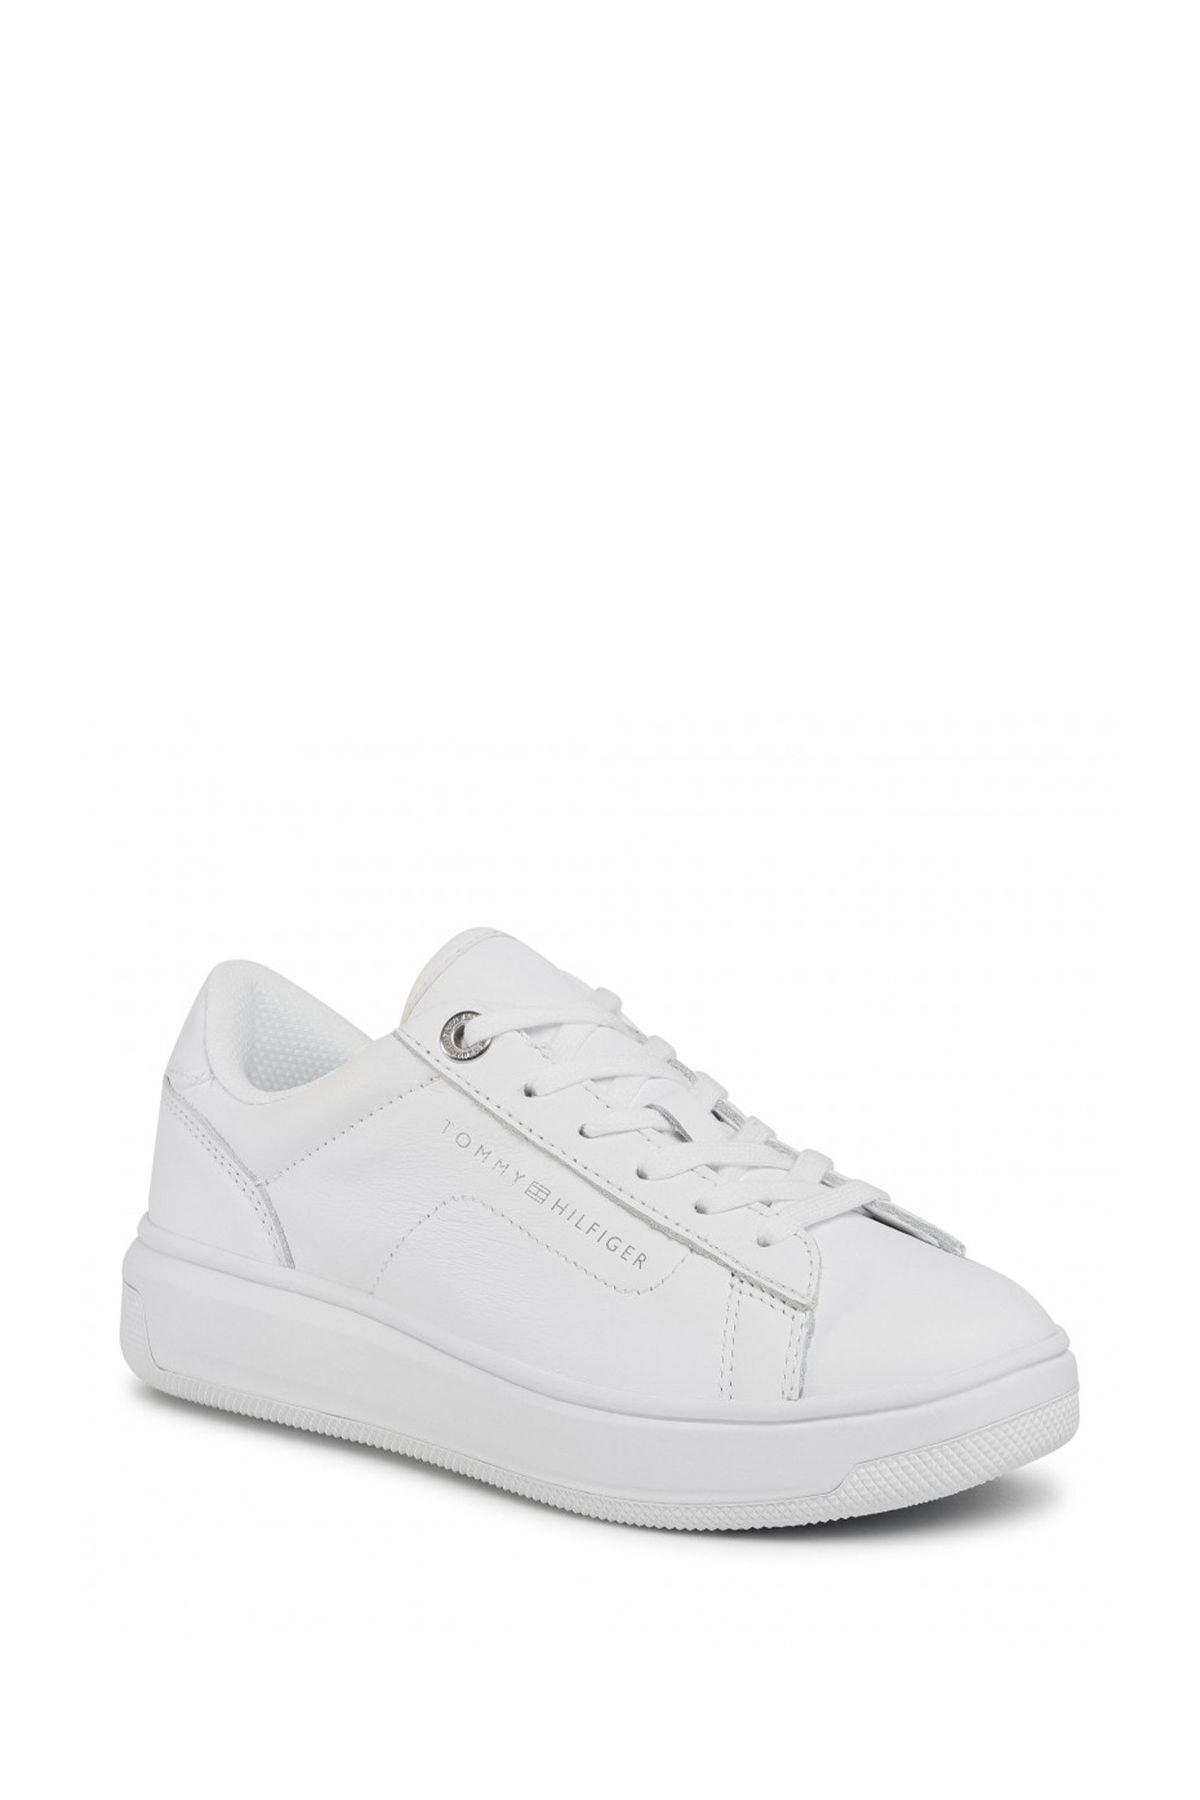 Tommy Hilfiger Kadın Beyaz Leather Cupsole Kadın Sneaker Fw0fw05009 1